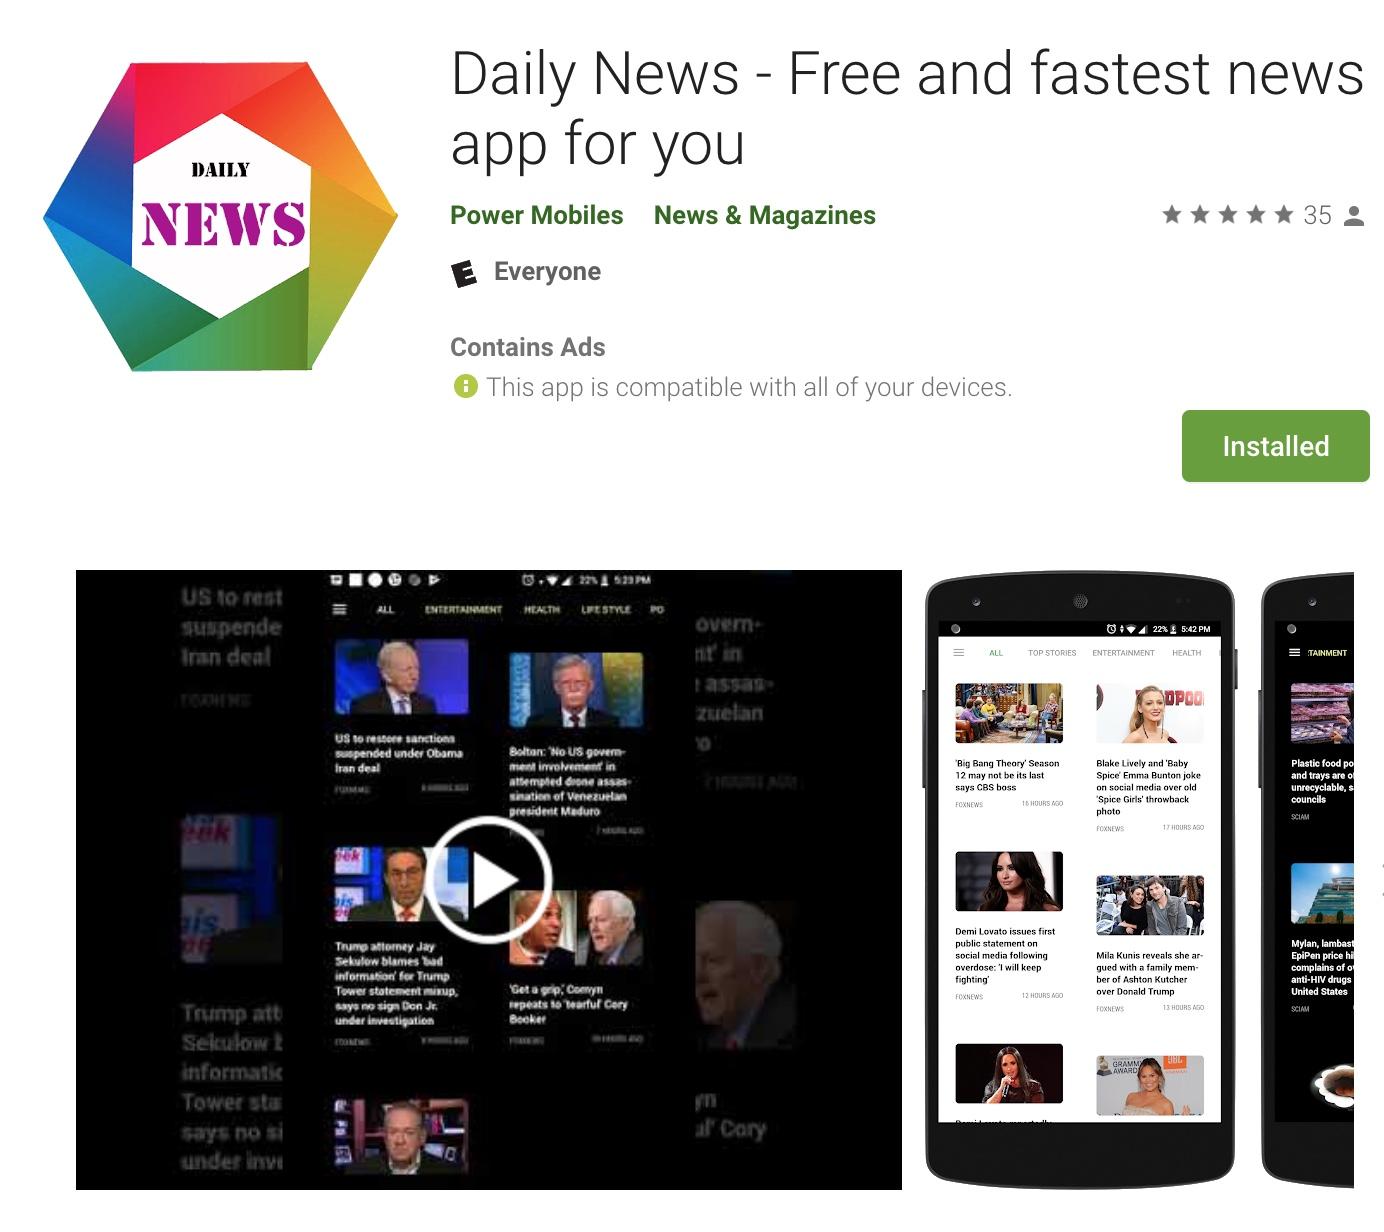 Daily News - Free App